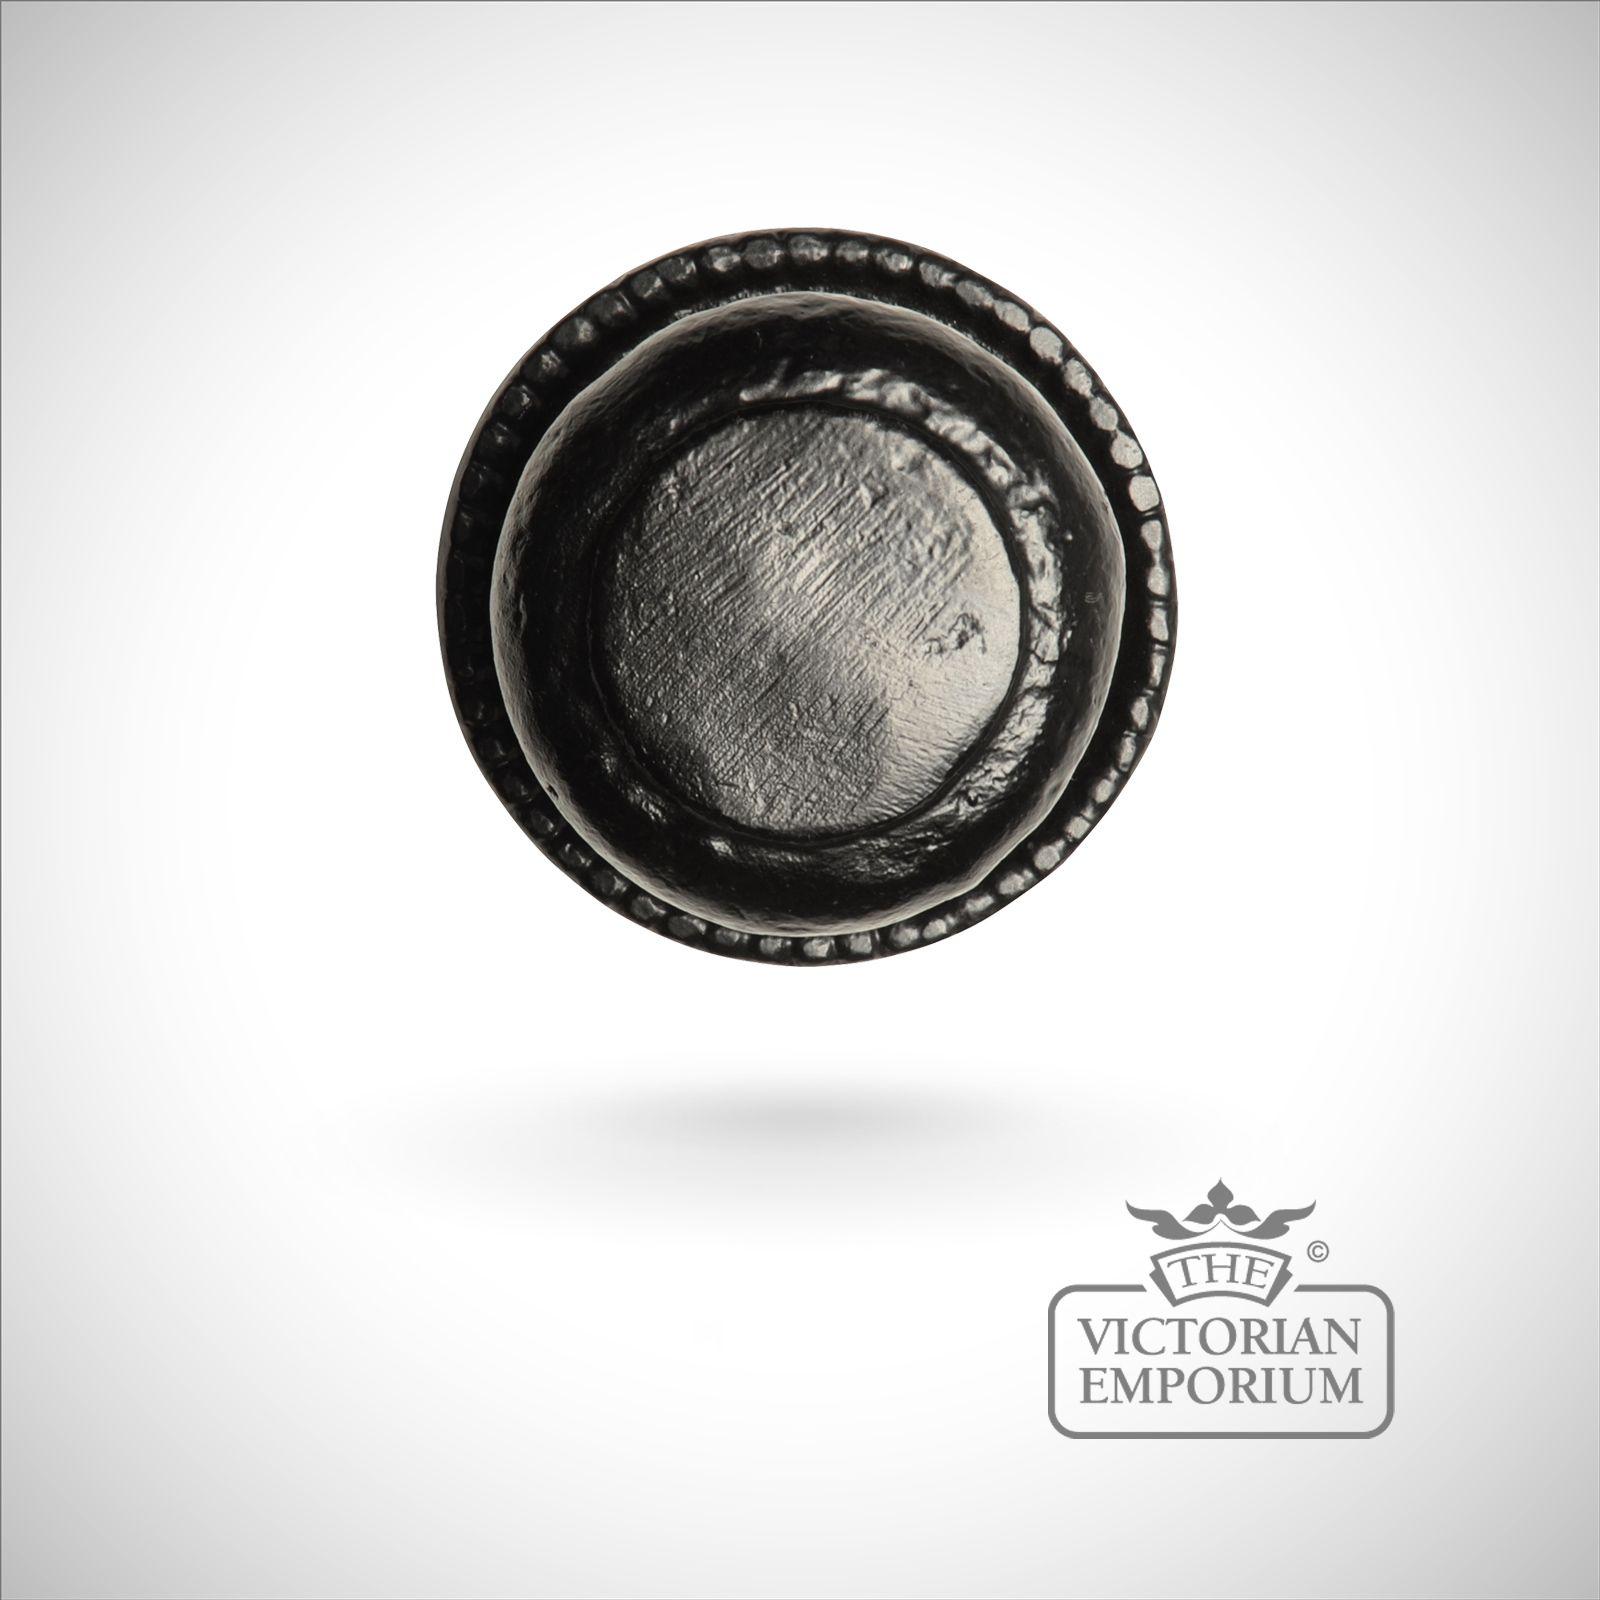 iron handcrafted centre door knob on round plate